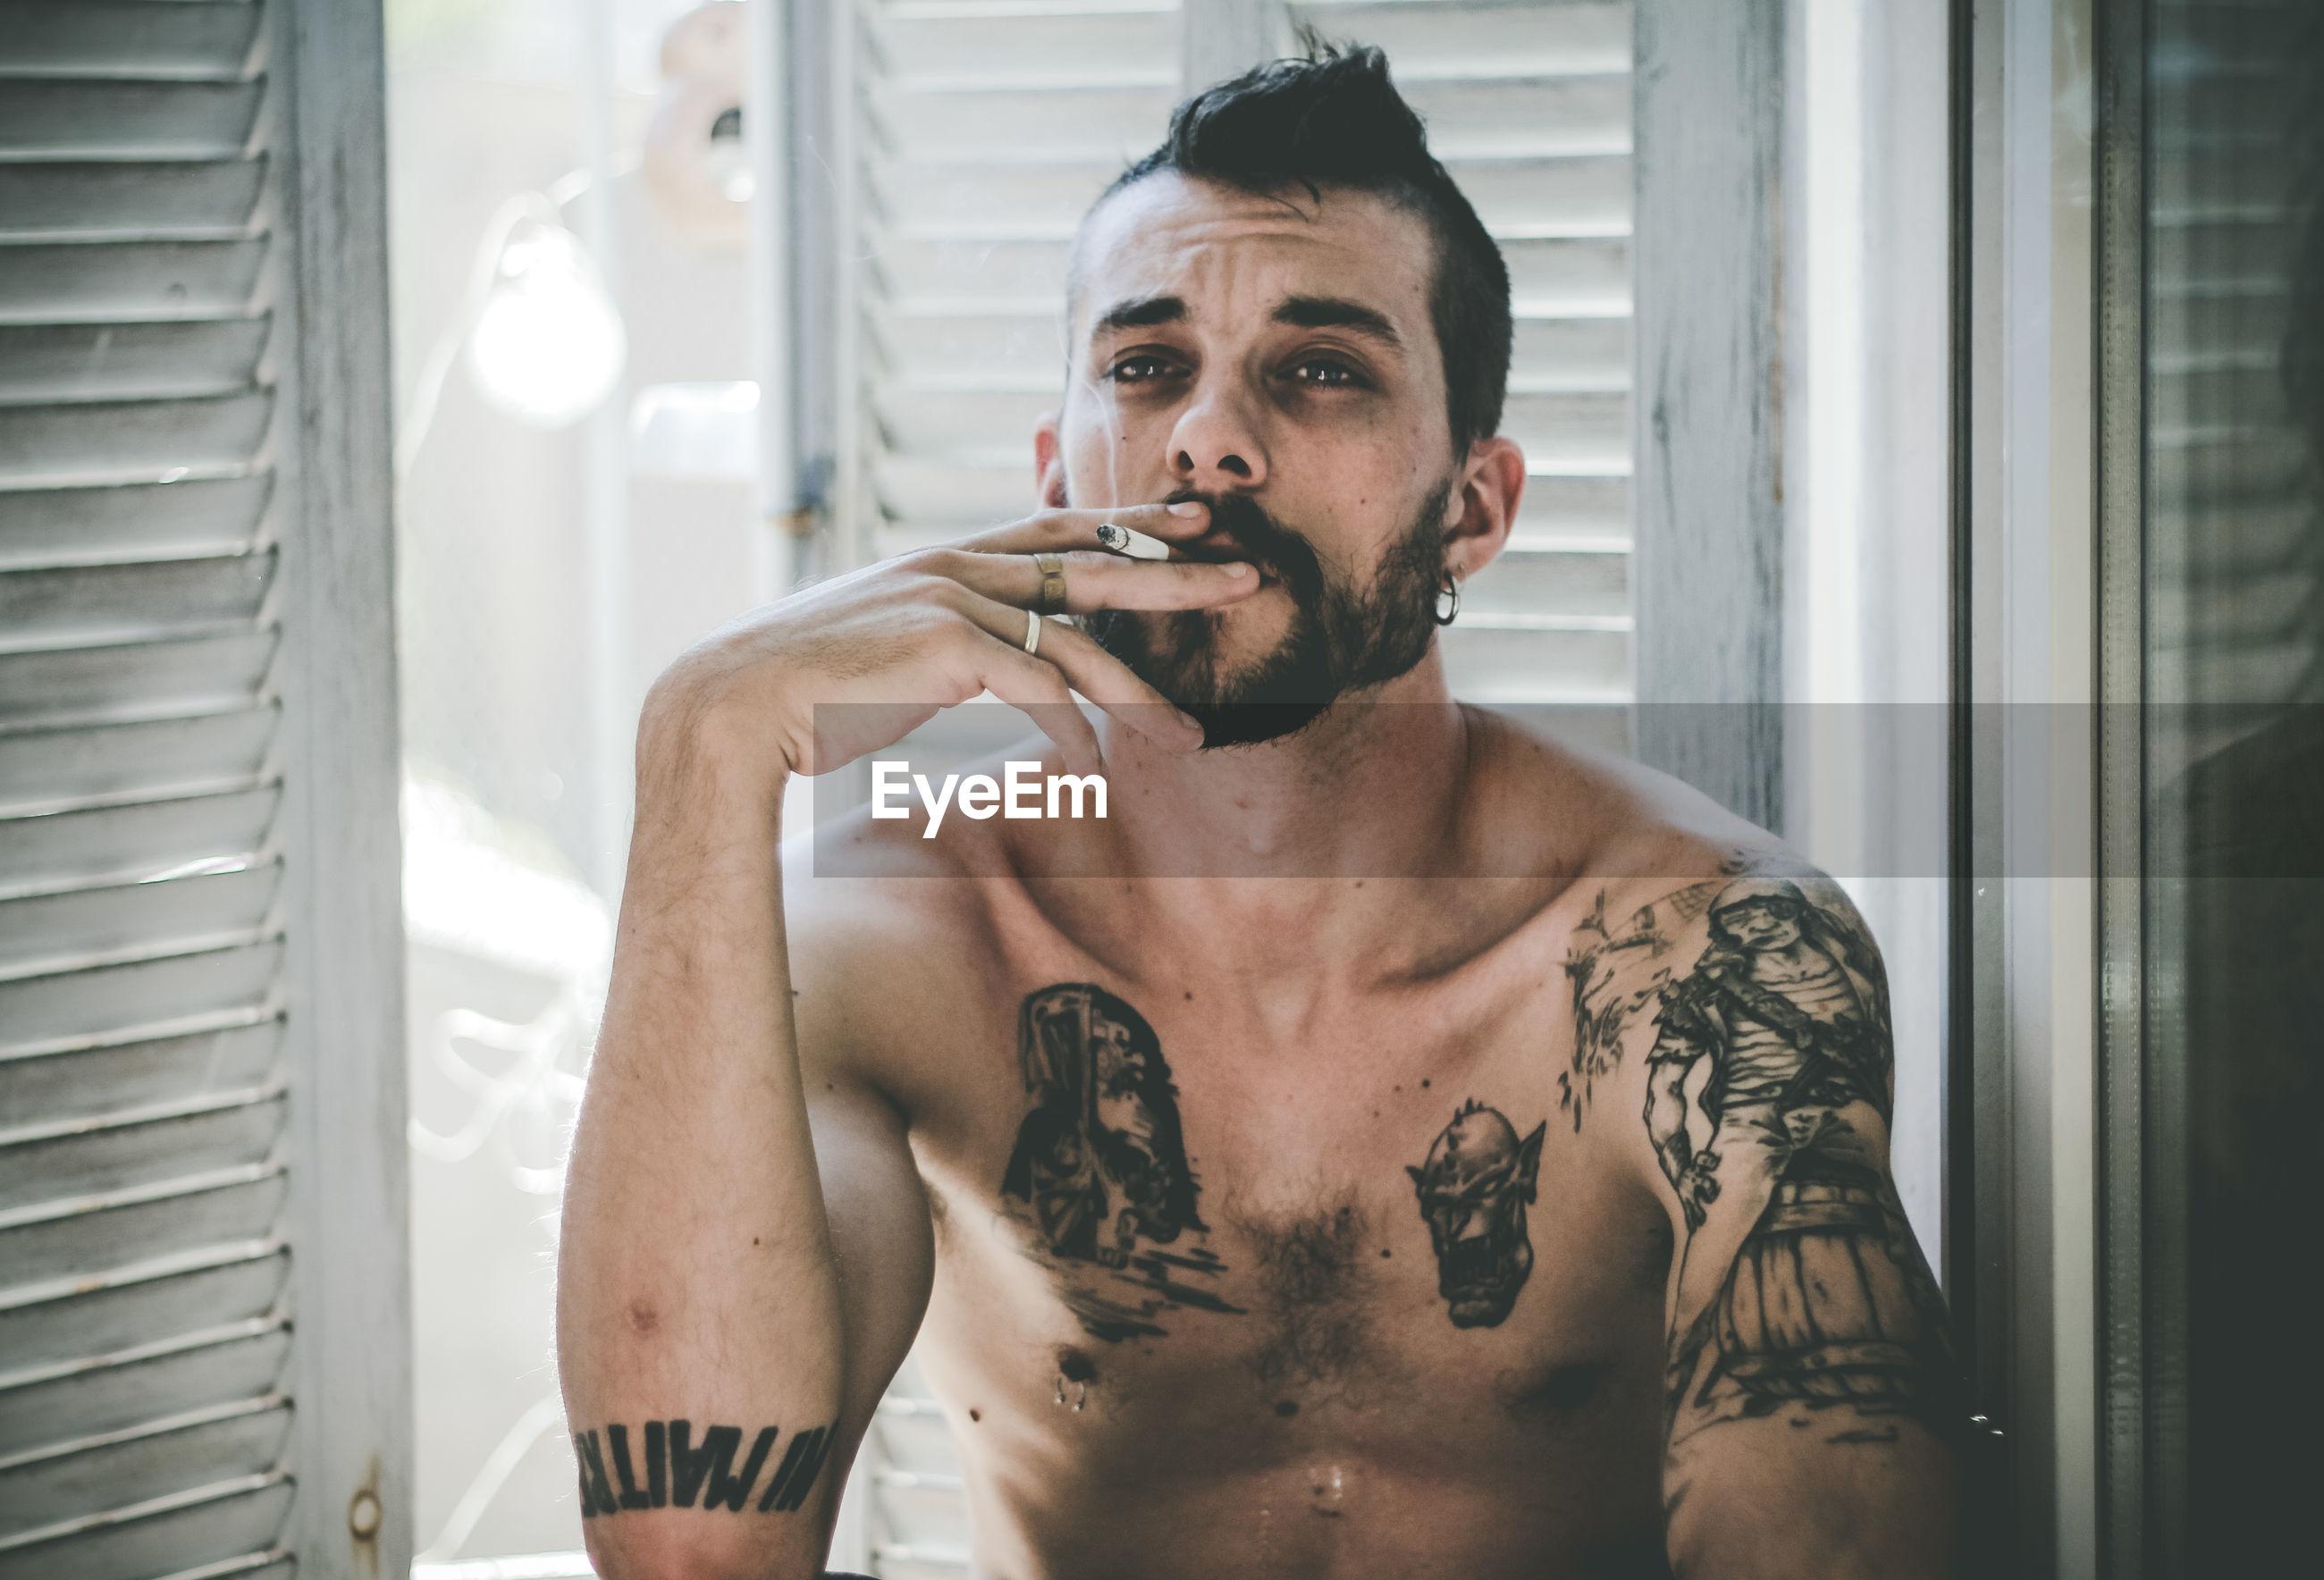 Close-up of shirtless man smoking cigarette at home